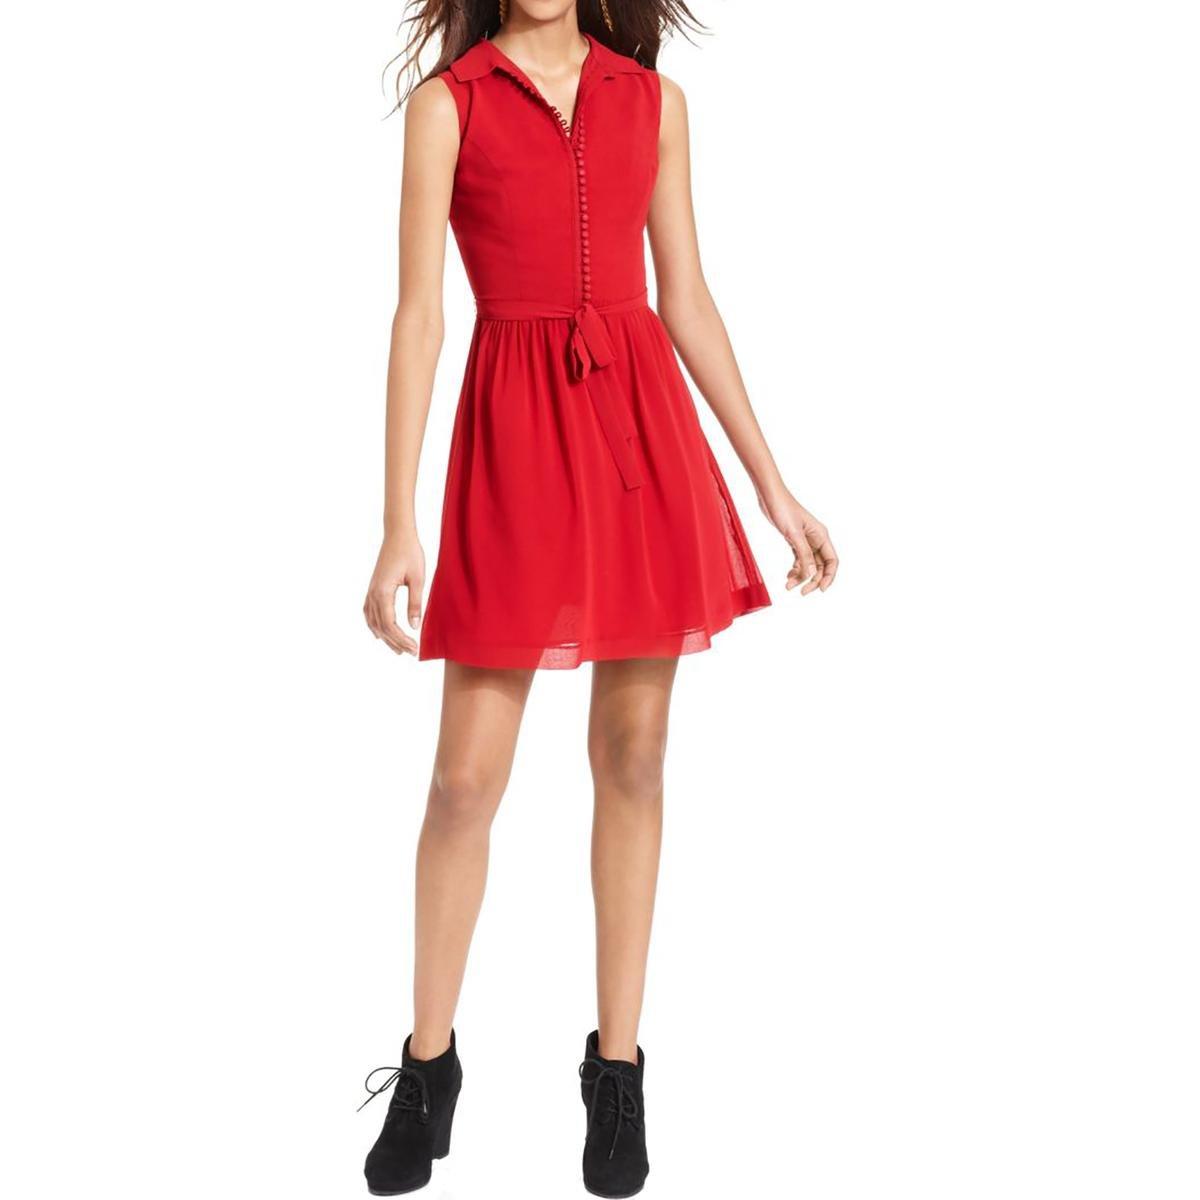 450105fadad7f Kensie Women's Crepe Chiffon Dress at Amazon Women's Clothing store: